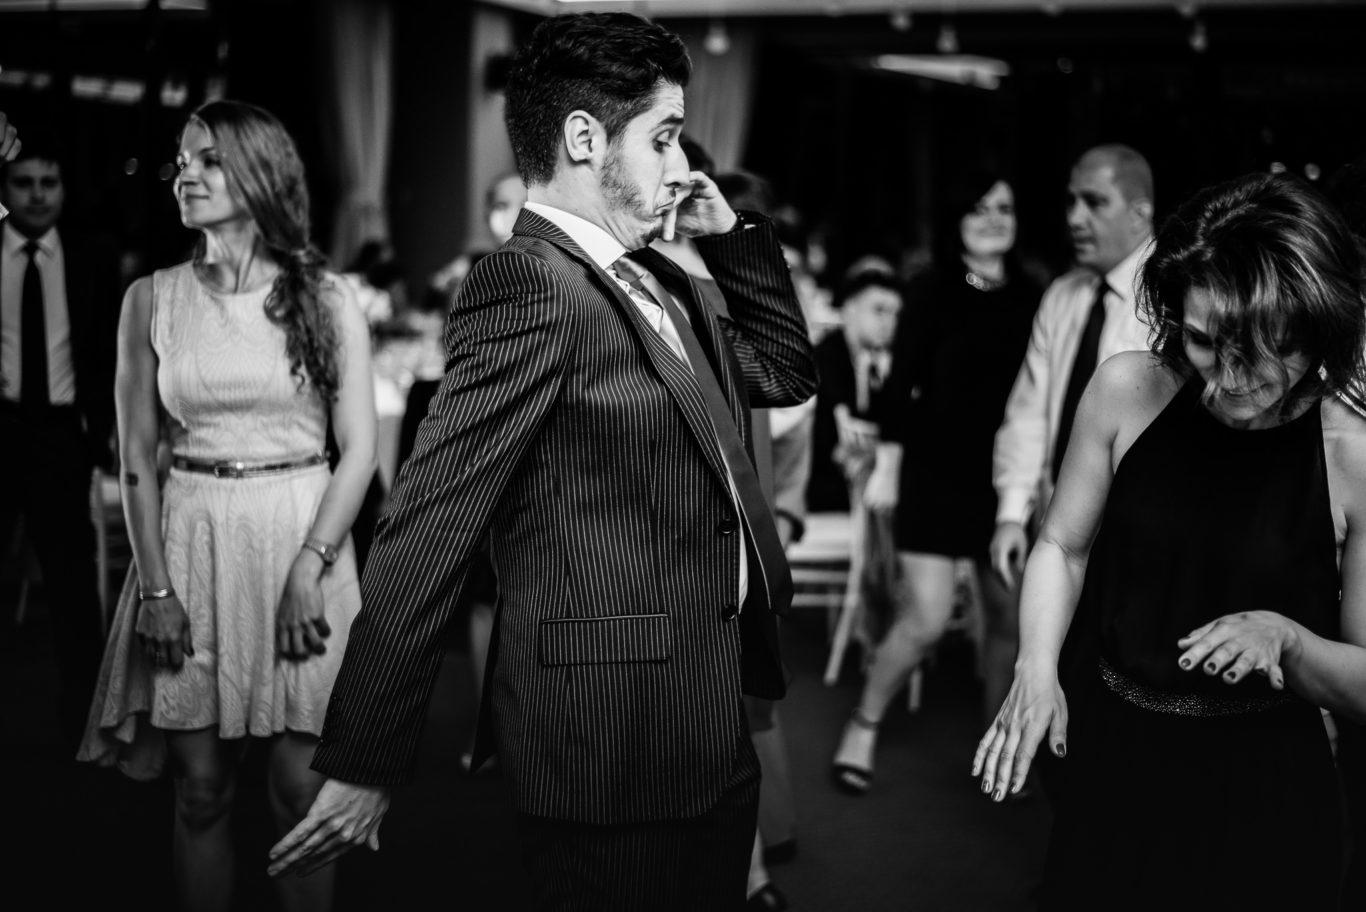 0778-Fotografie-nunta-Bucuresti-Oana-Catalin-fotograf-Ciprian-Dumitrescu-DSC_5417